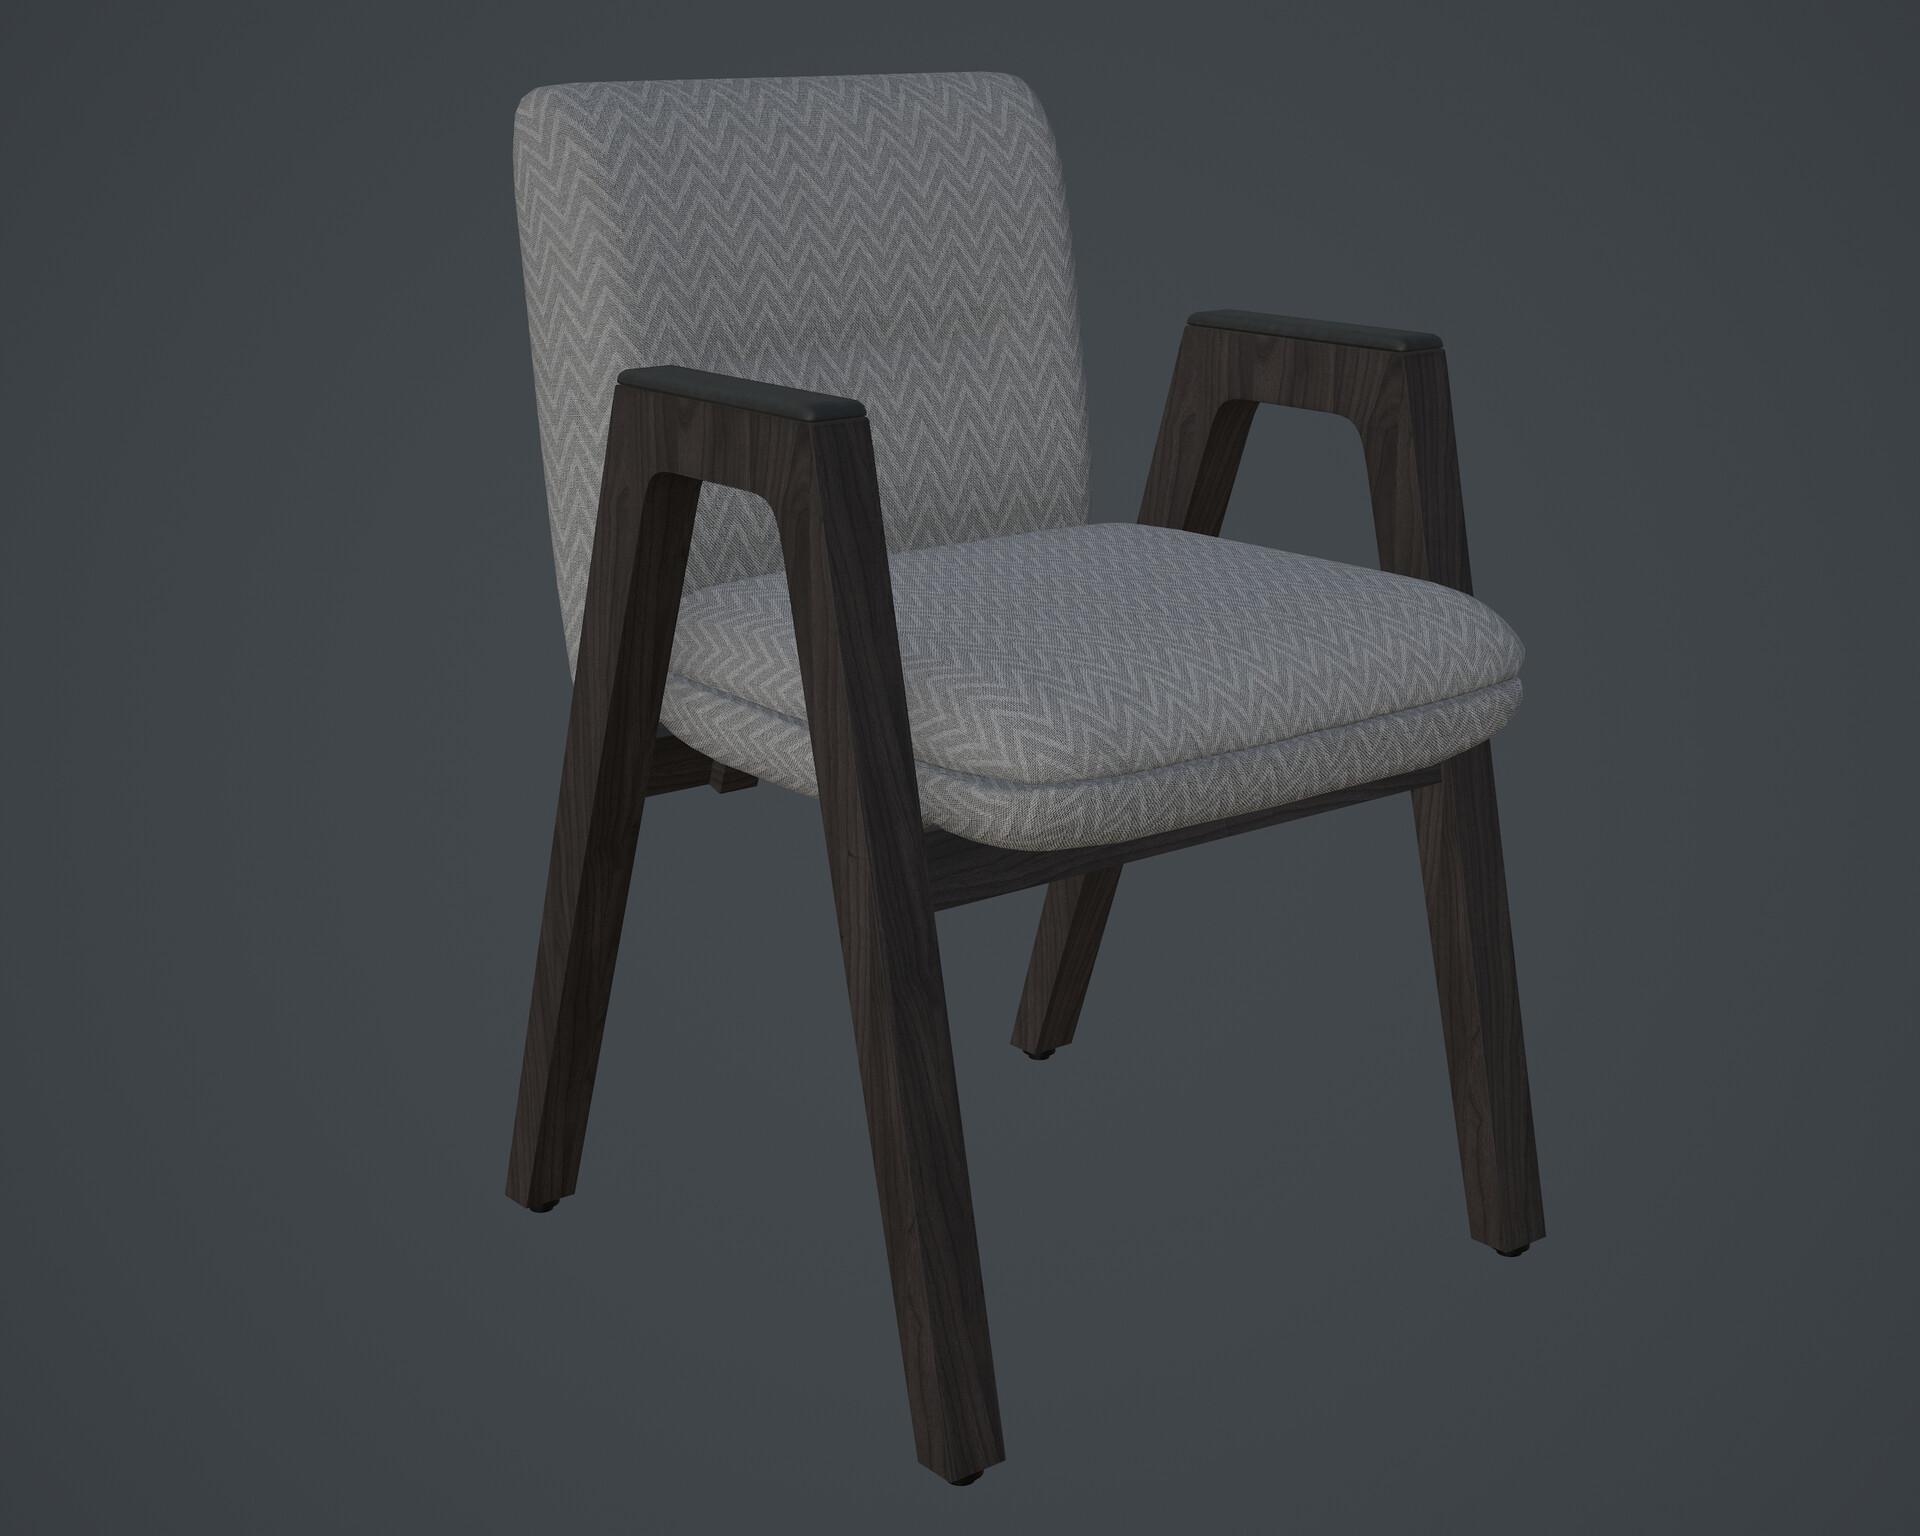 Amit kolay chair marmoset